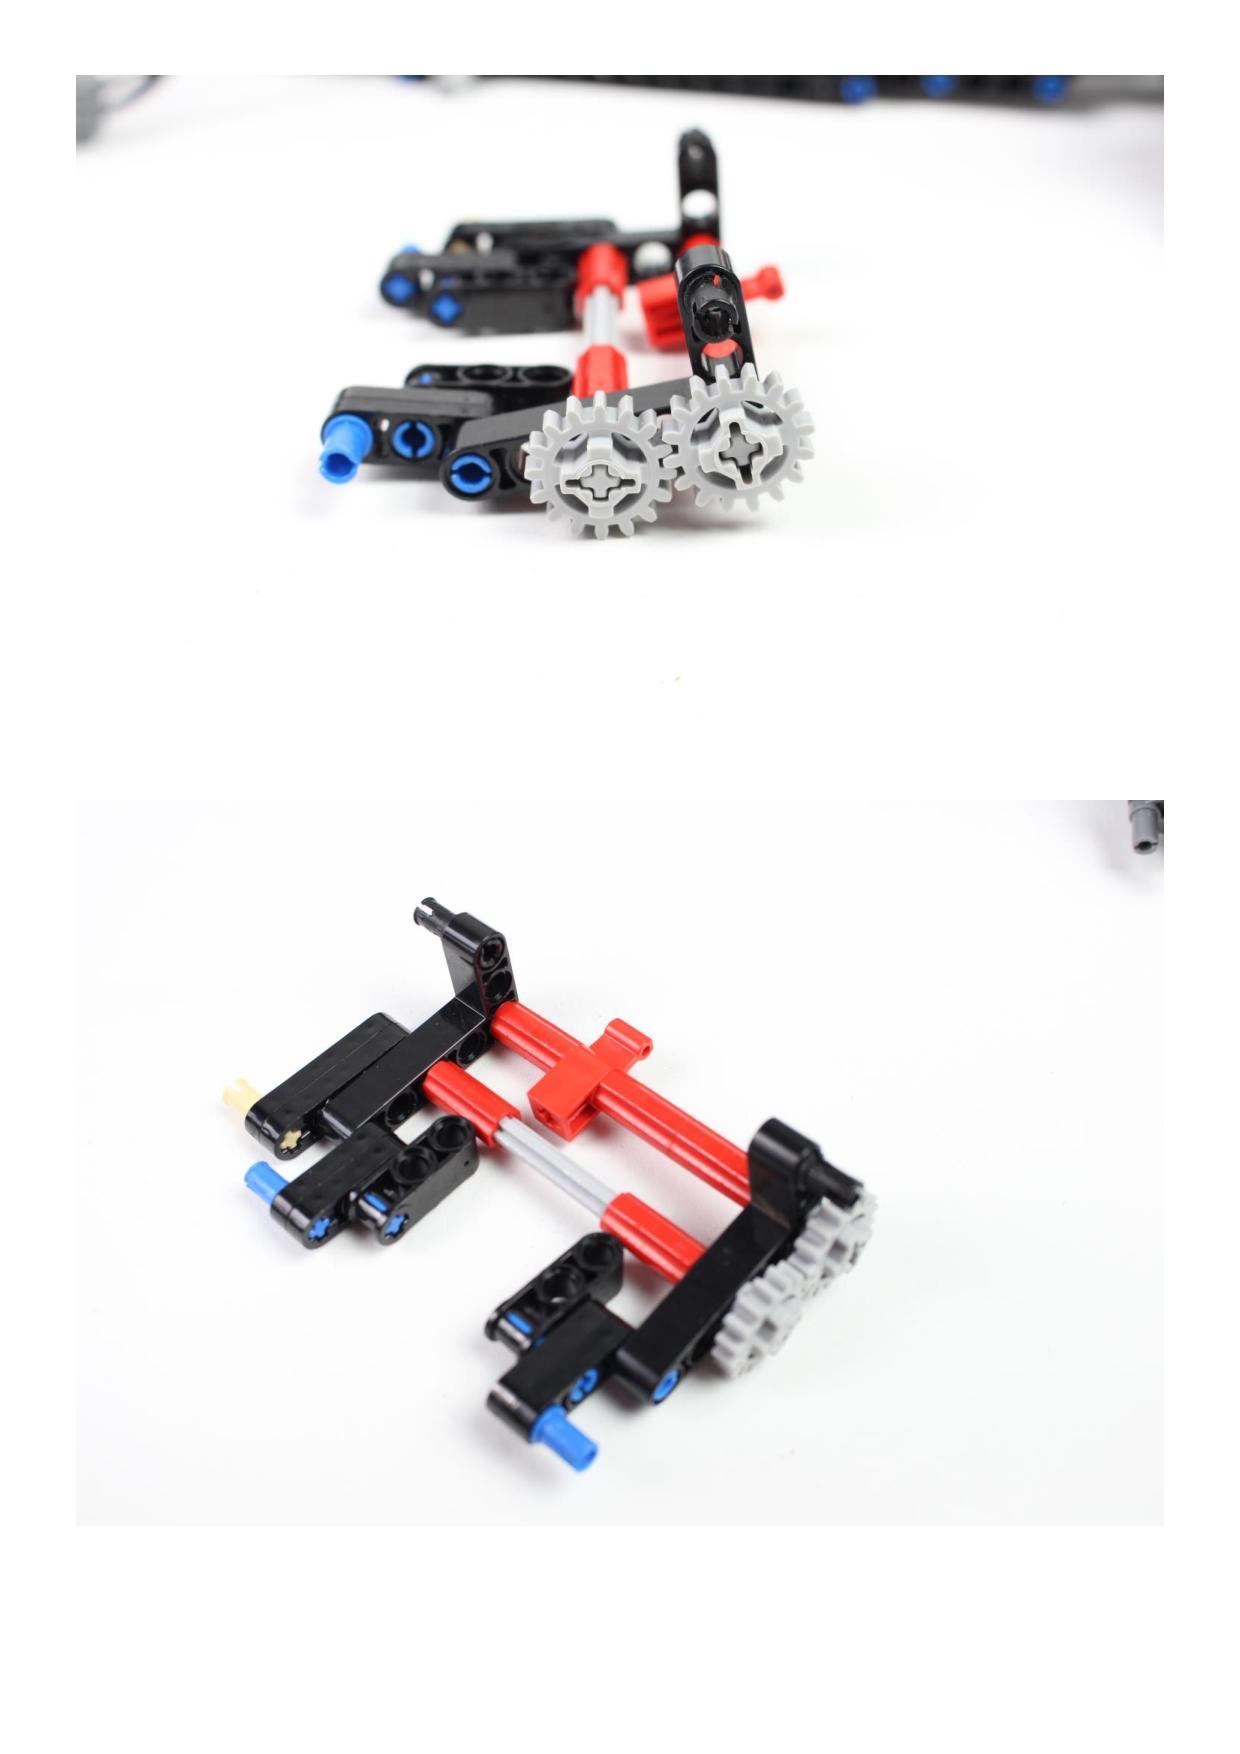 Lego Halo Warthog « Nico71's Creations